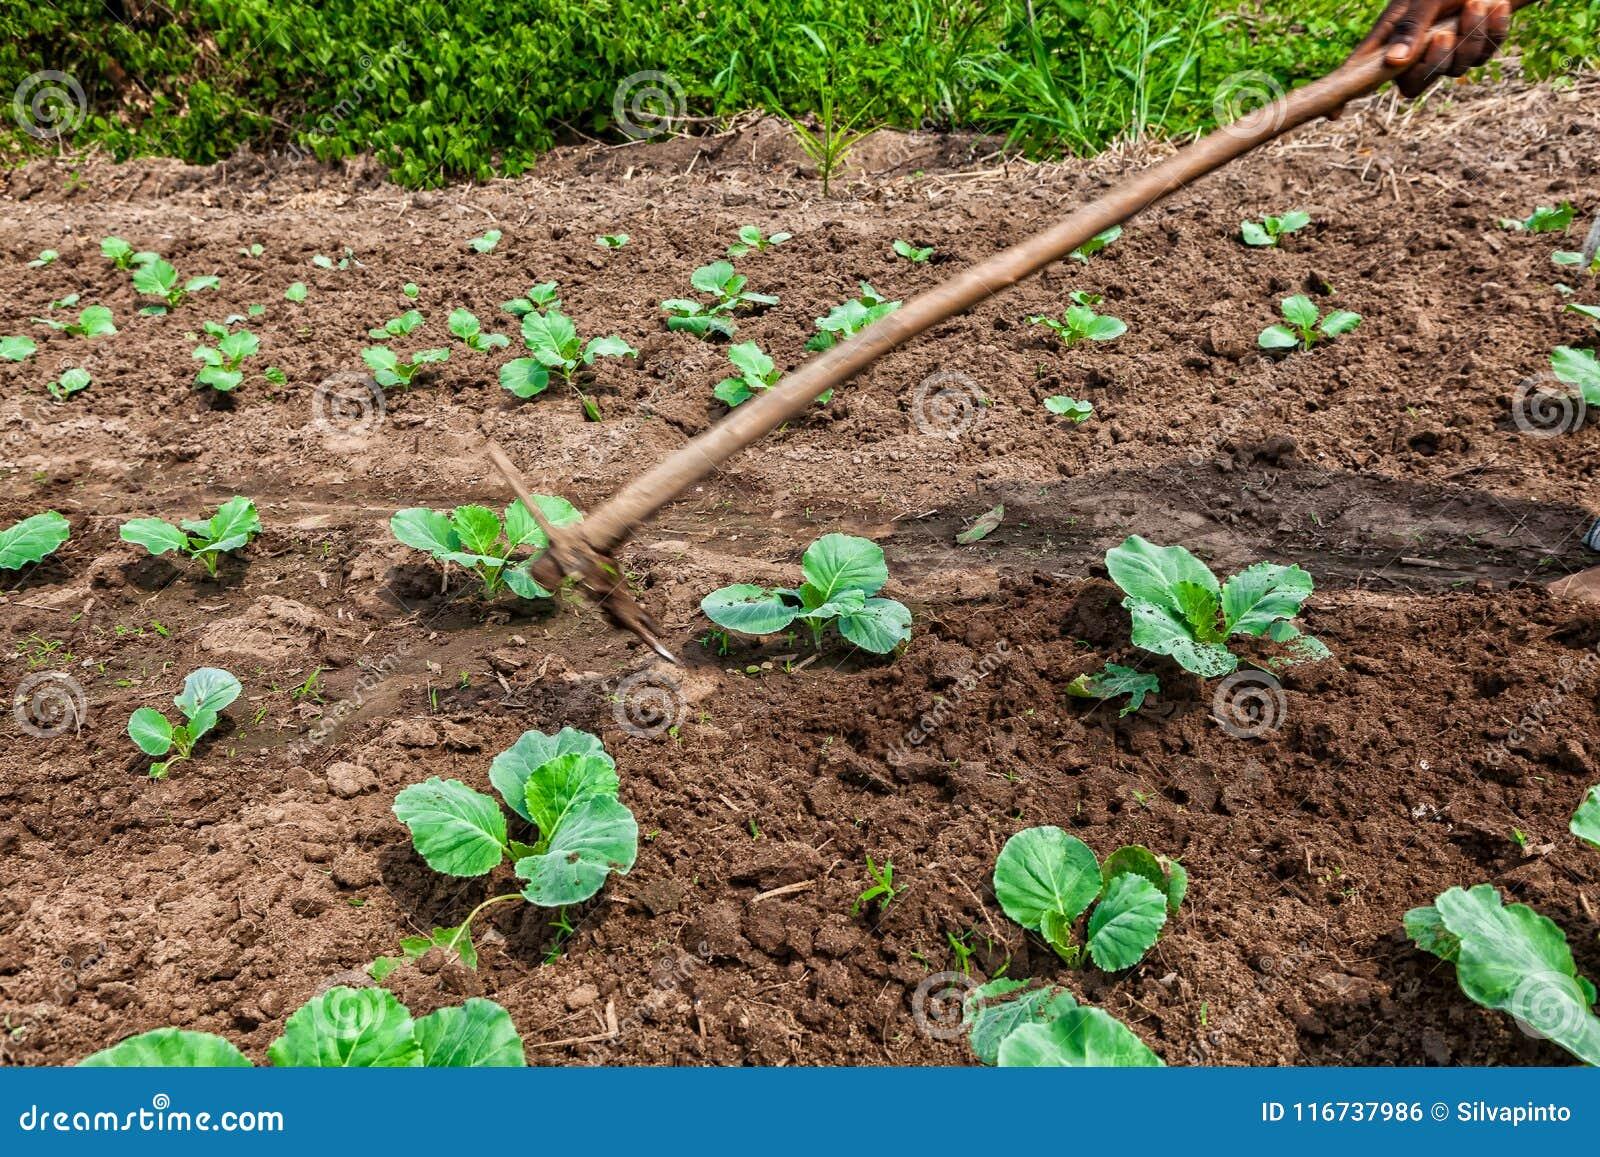 farmer farming pictures